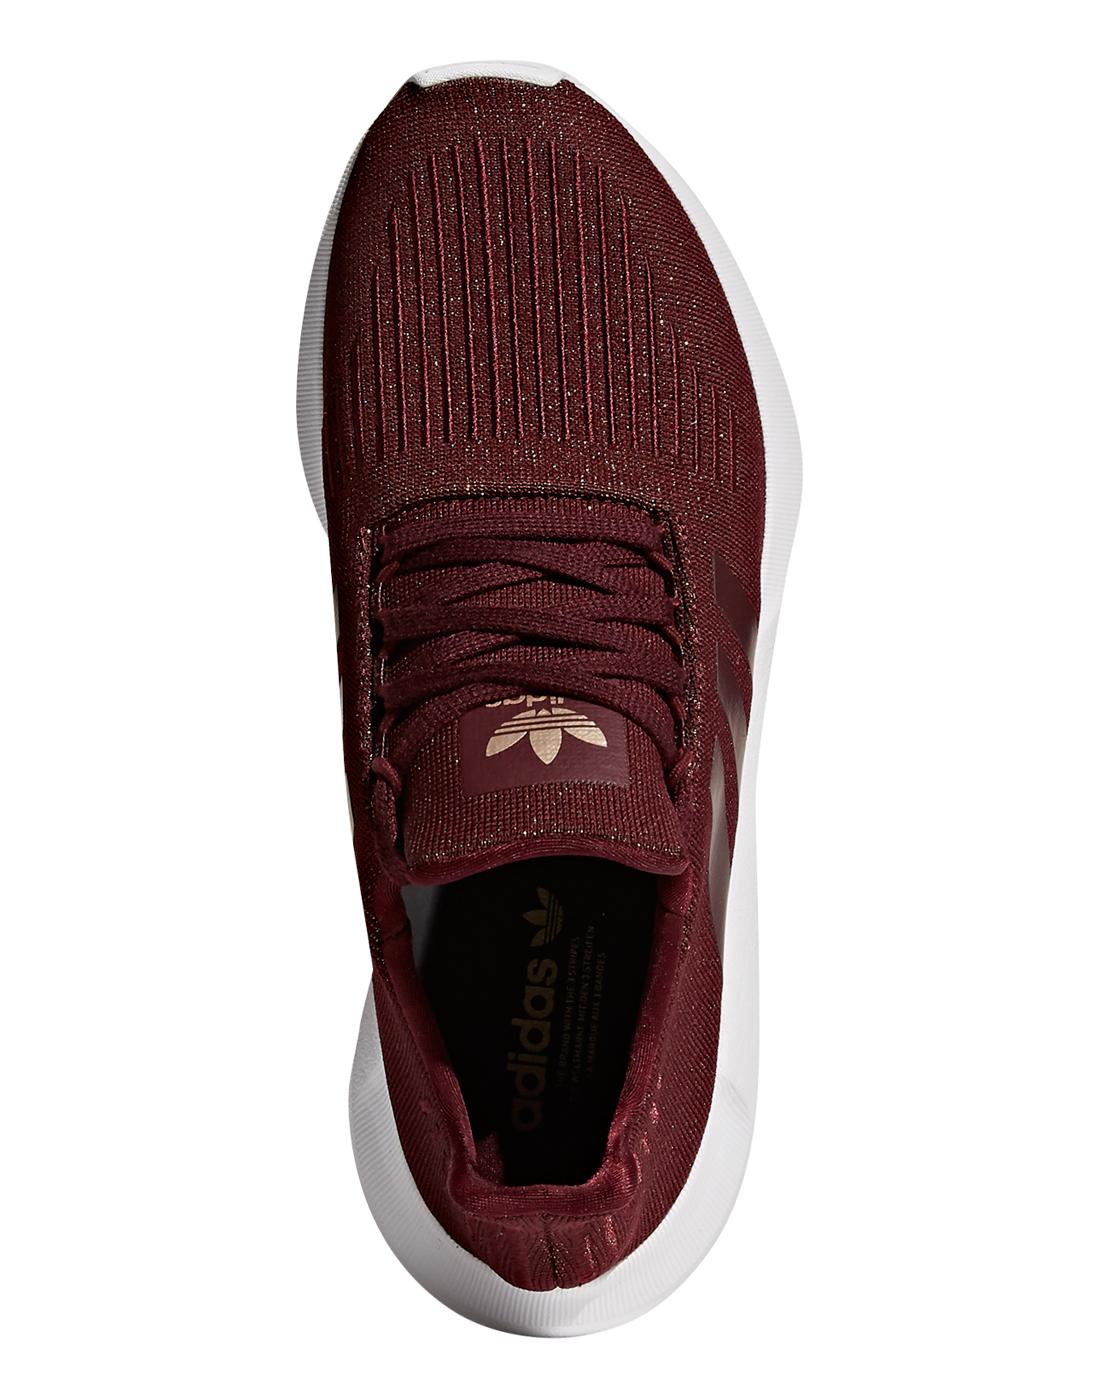 9a6c72ab532c4 adidas Originals Womens Swift Run